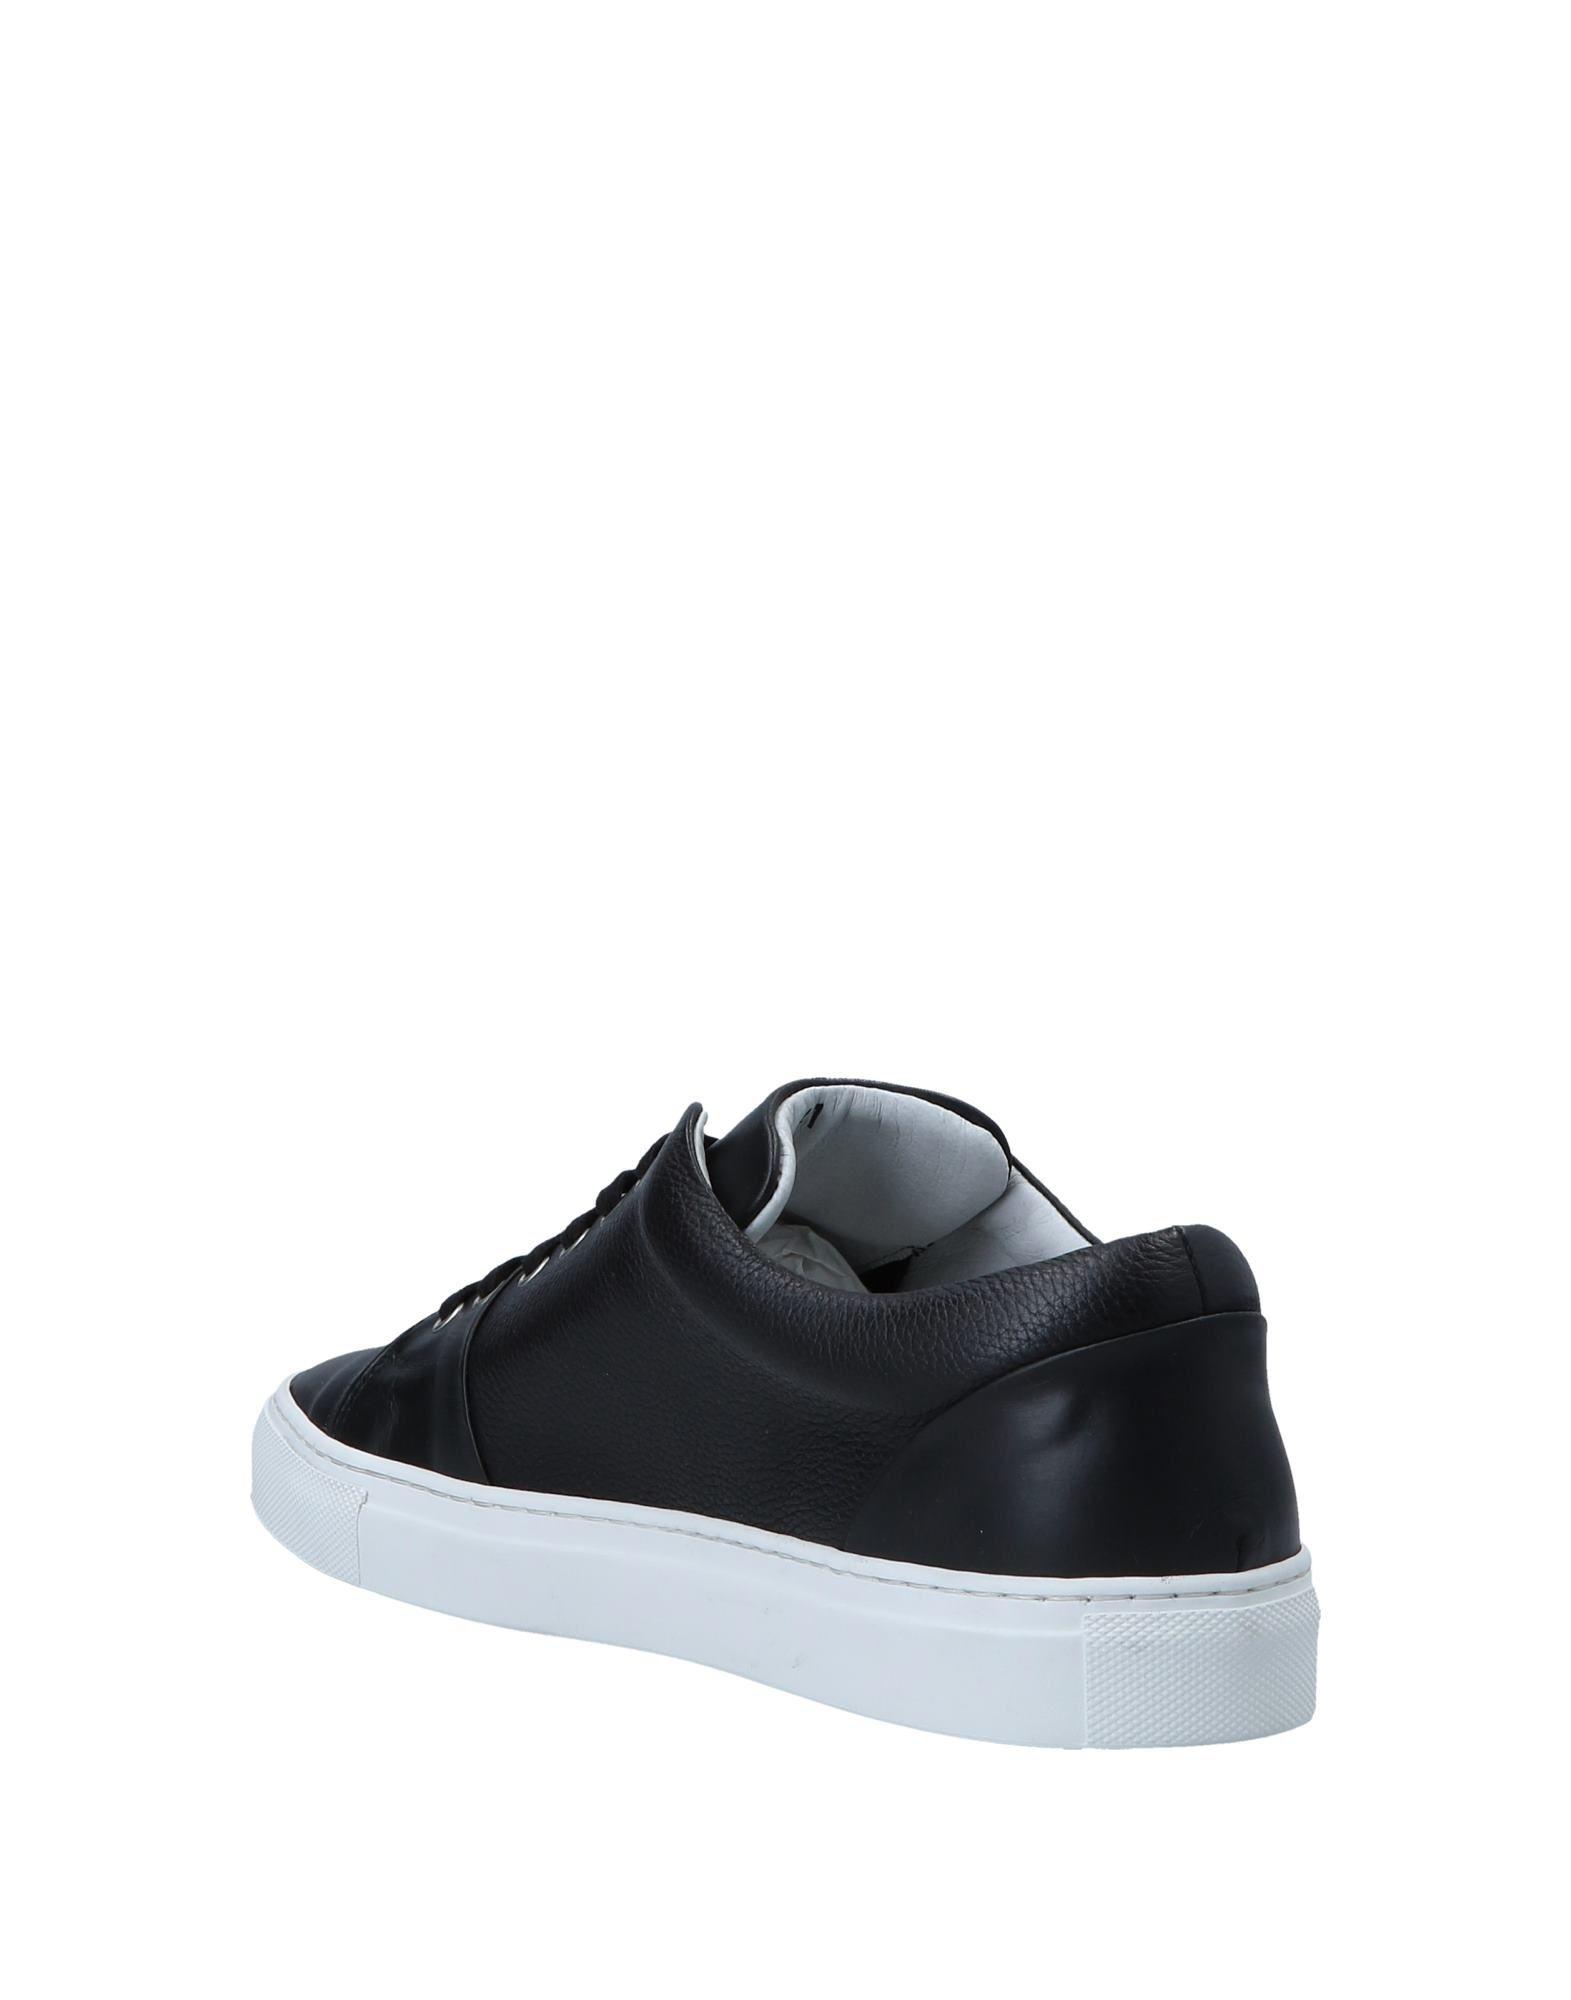 Fabiano Ricci Sneakers - Men Fabiano Ricci Ricci Ricci Sneakers online on  Canada - 11548483FC bd3131